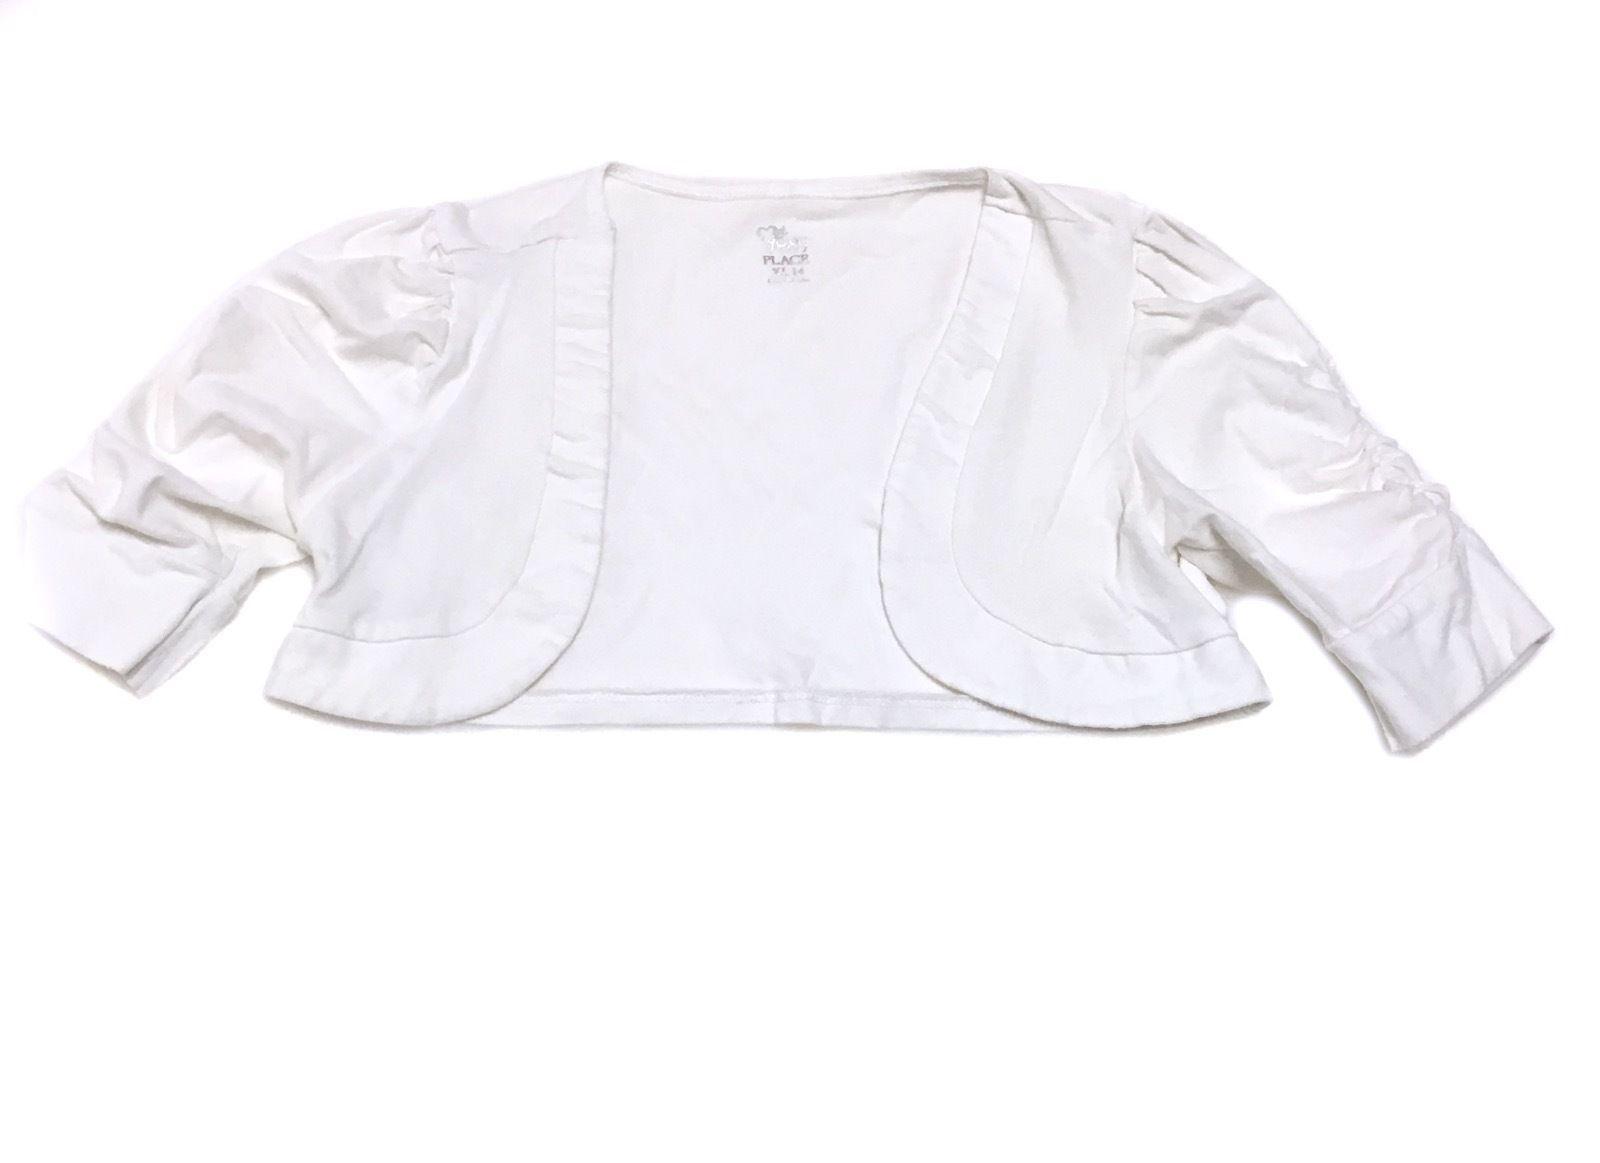 Childrens Place Cardigan White Bolero Shrug Knit Cotton Sweater Top Girls XL 14 - $8.90